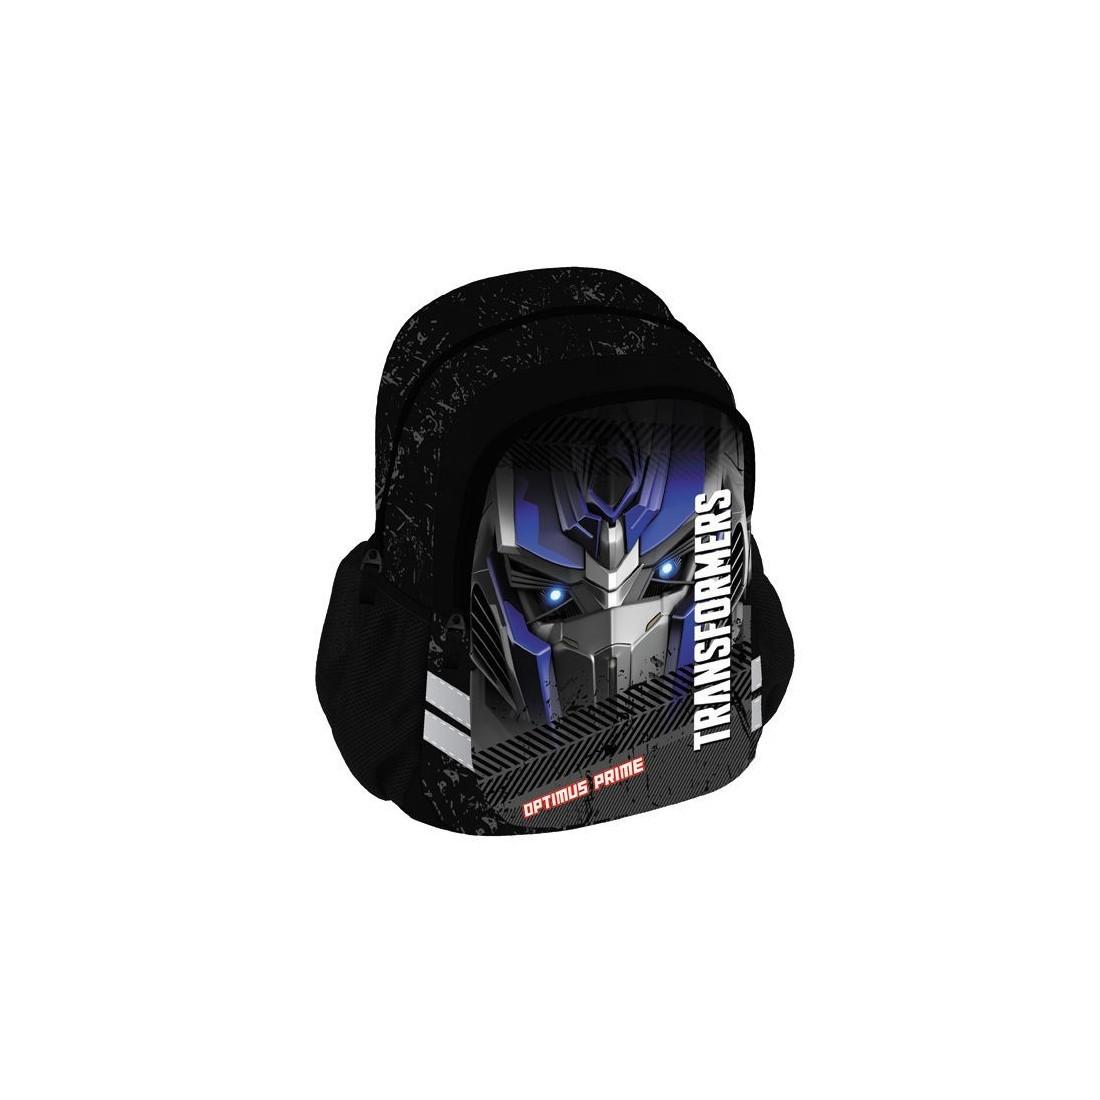 Plecak Szkolny Transformers Optimus Prime - plecak-tornister.pl